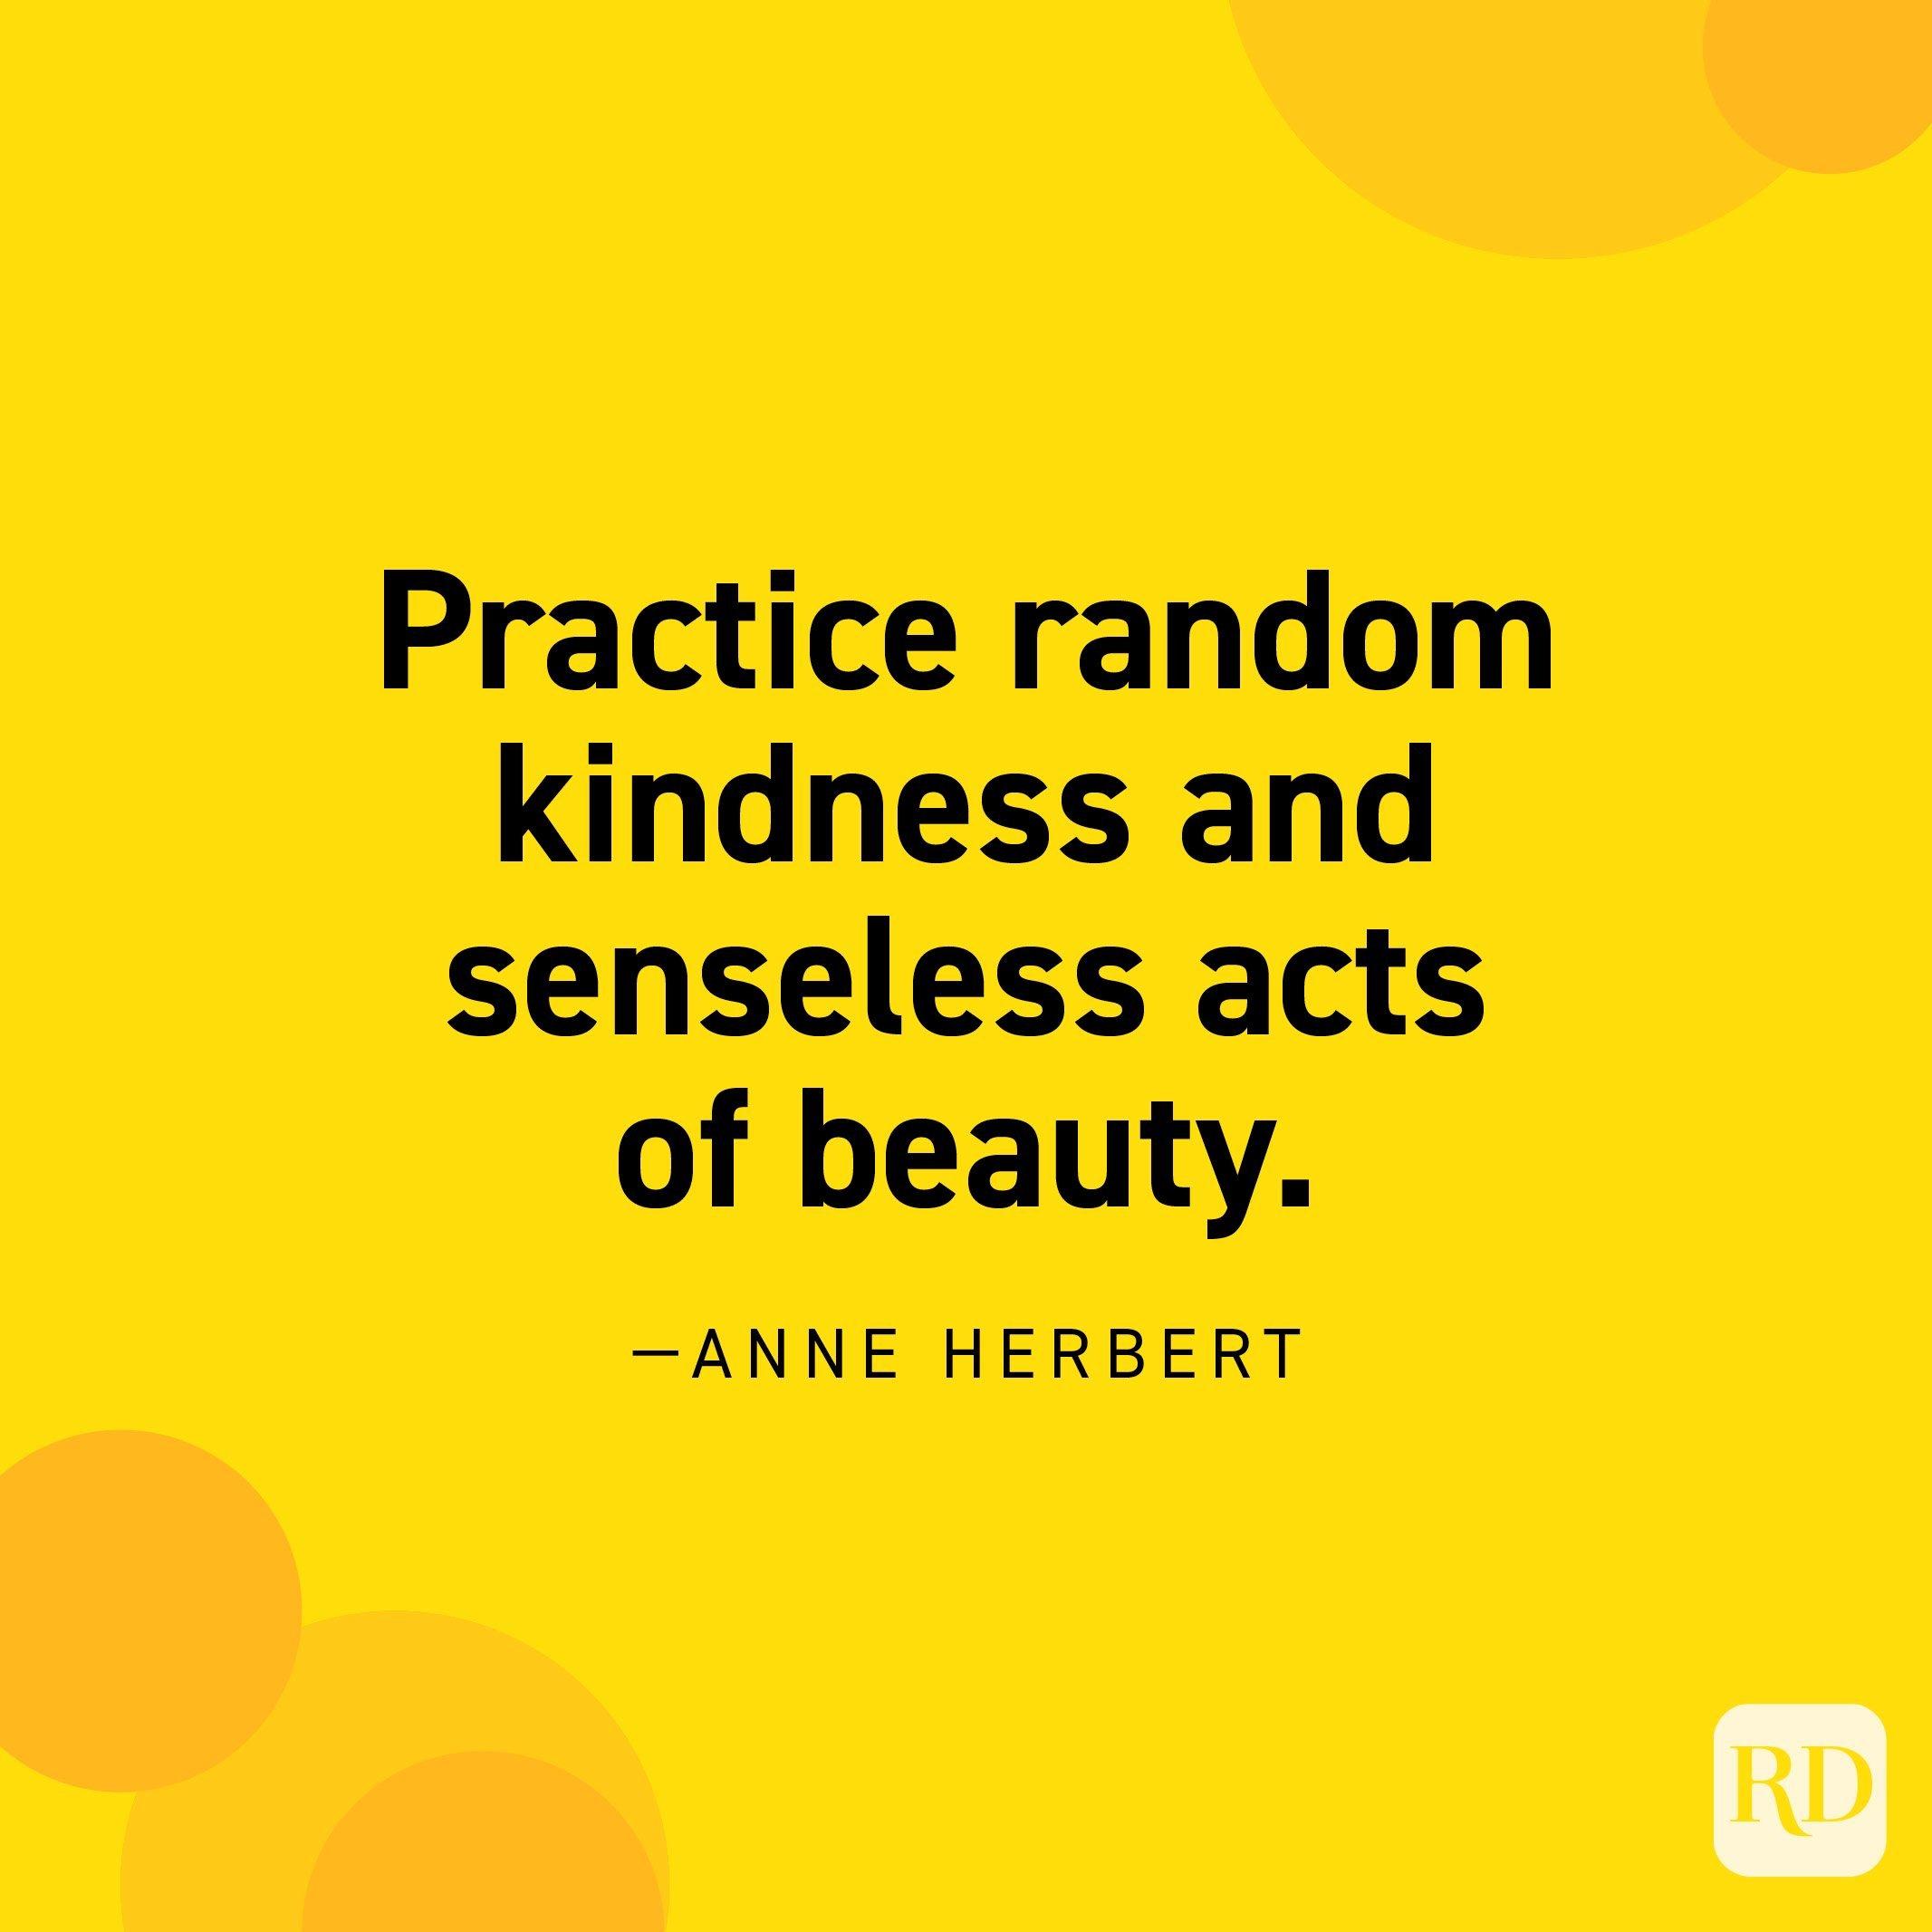 """Practice random kindness and senseless acts of beauty."" —Anne Herbert."